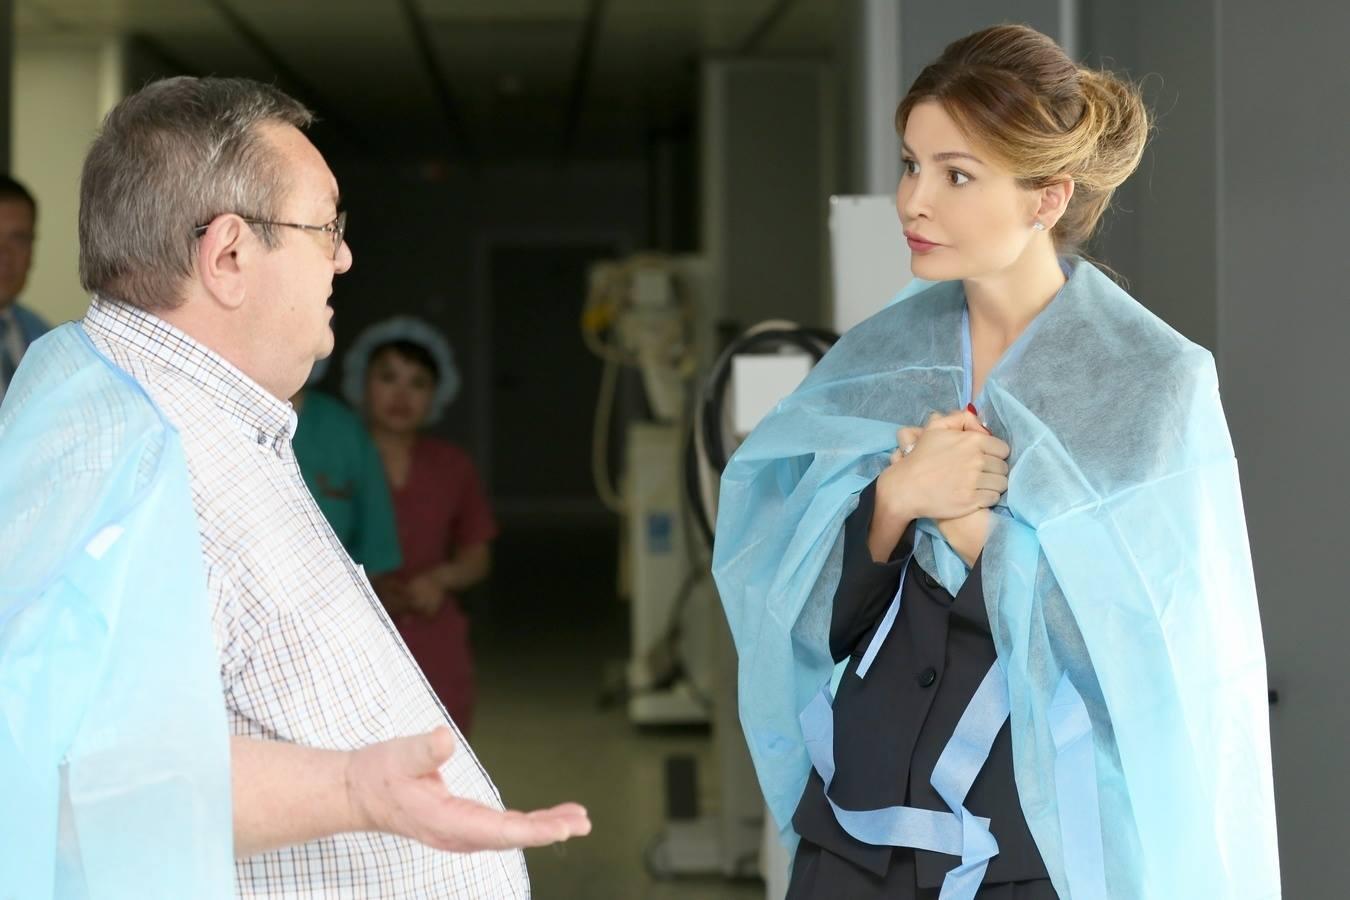 Ислама Каримова лечат русские медики